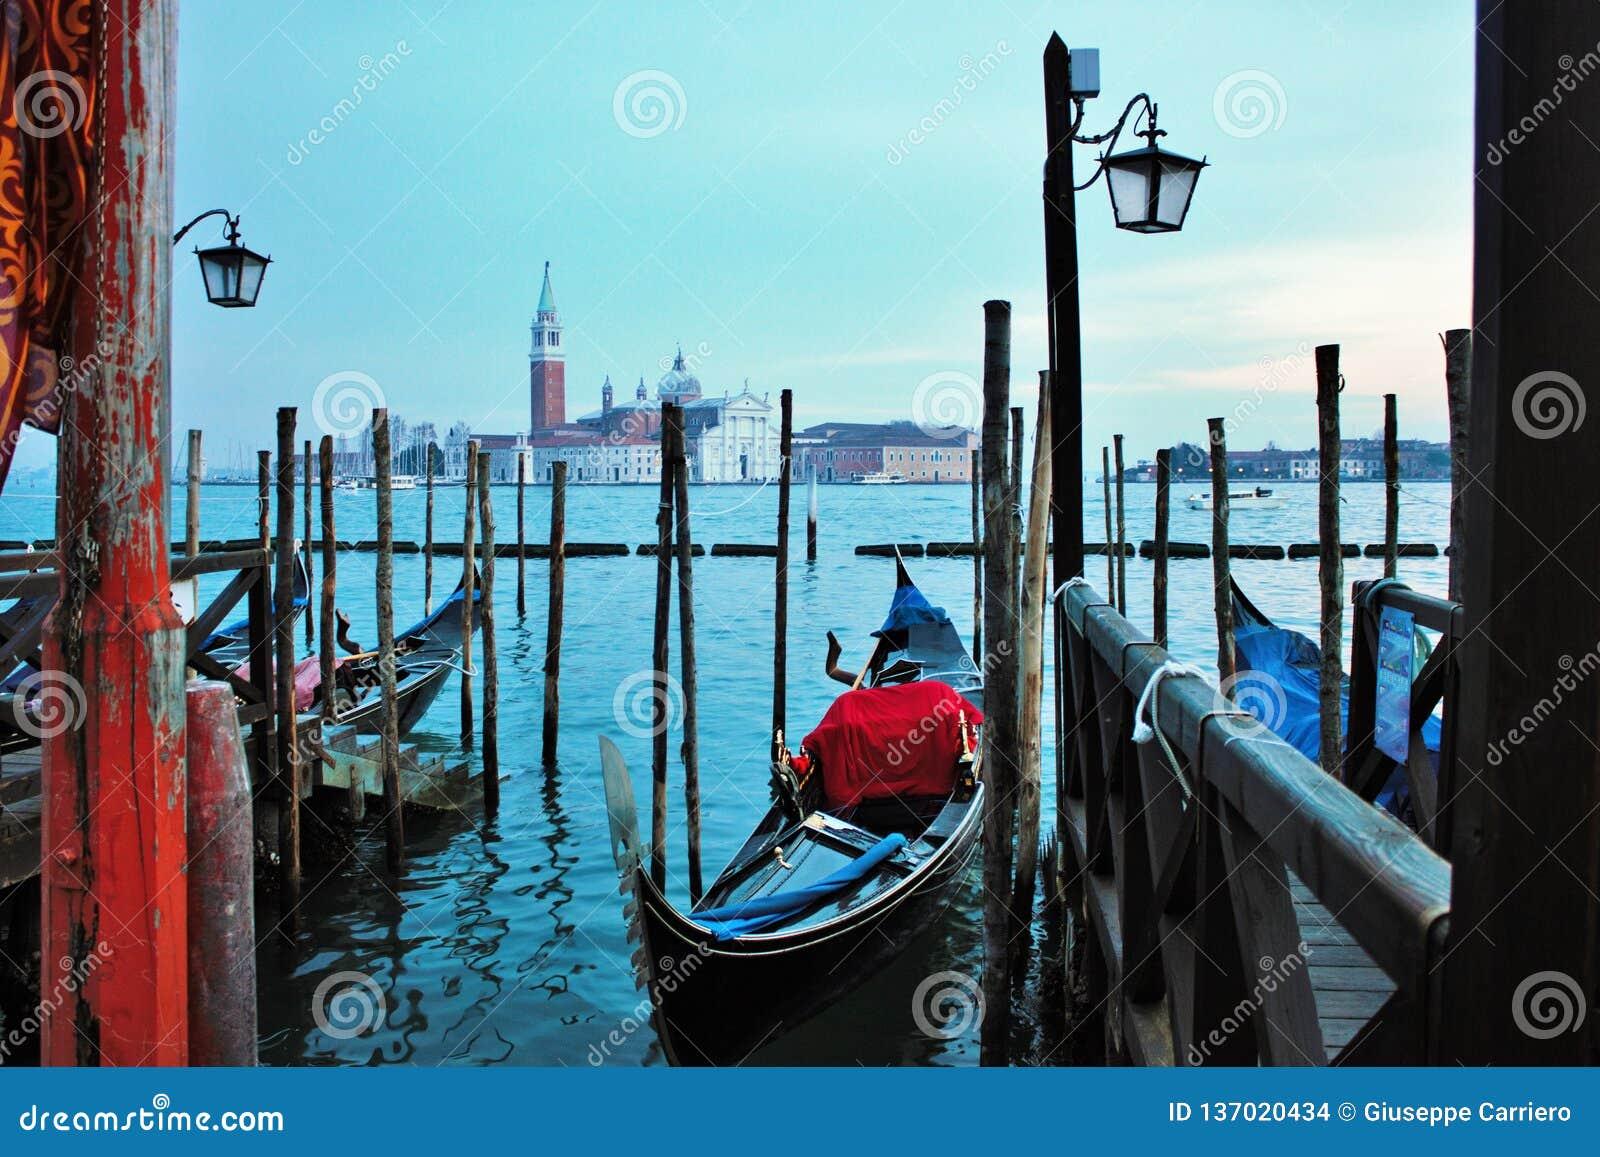 Venezia marco πλατειών SAN, ένα από τα panoramas που μπορείτε να δείτε